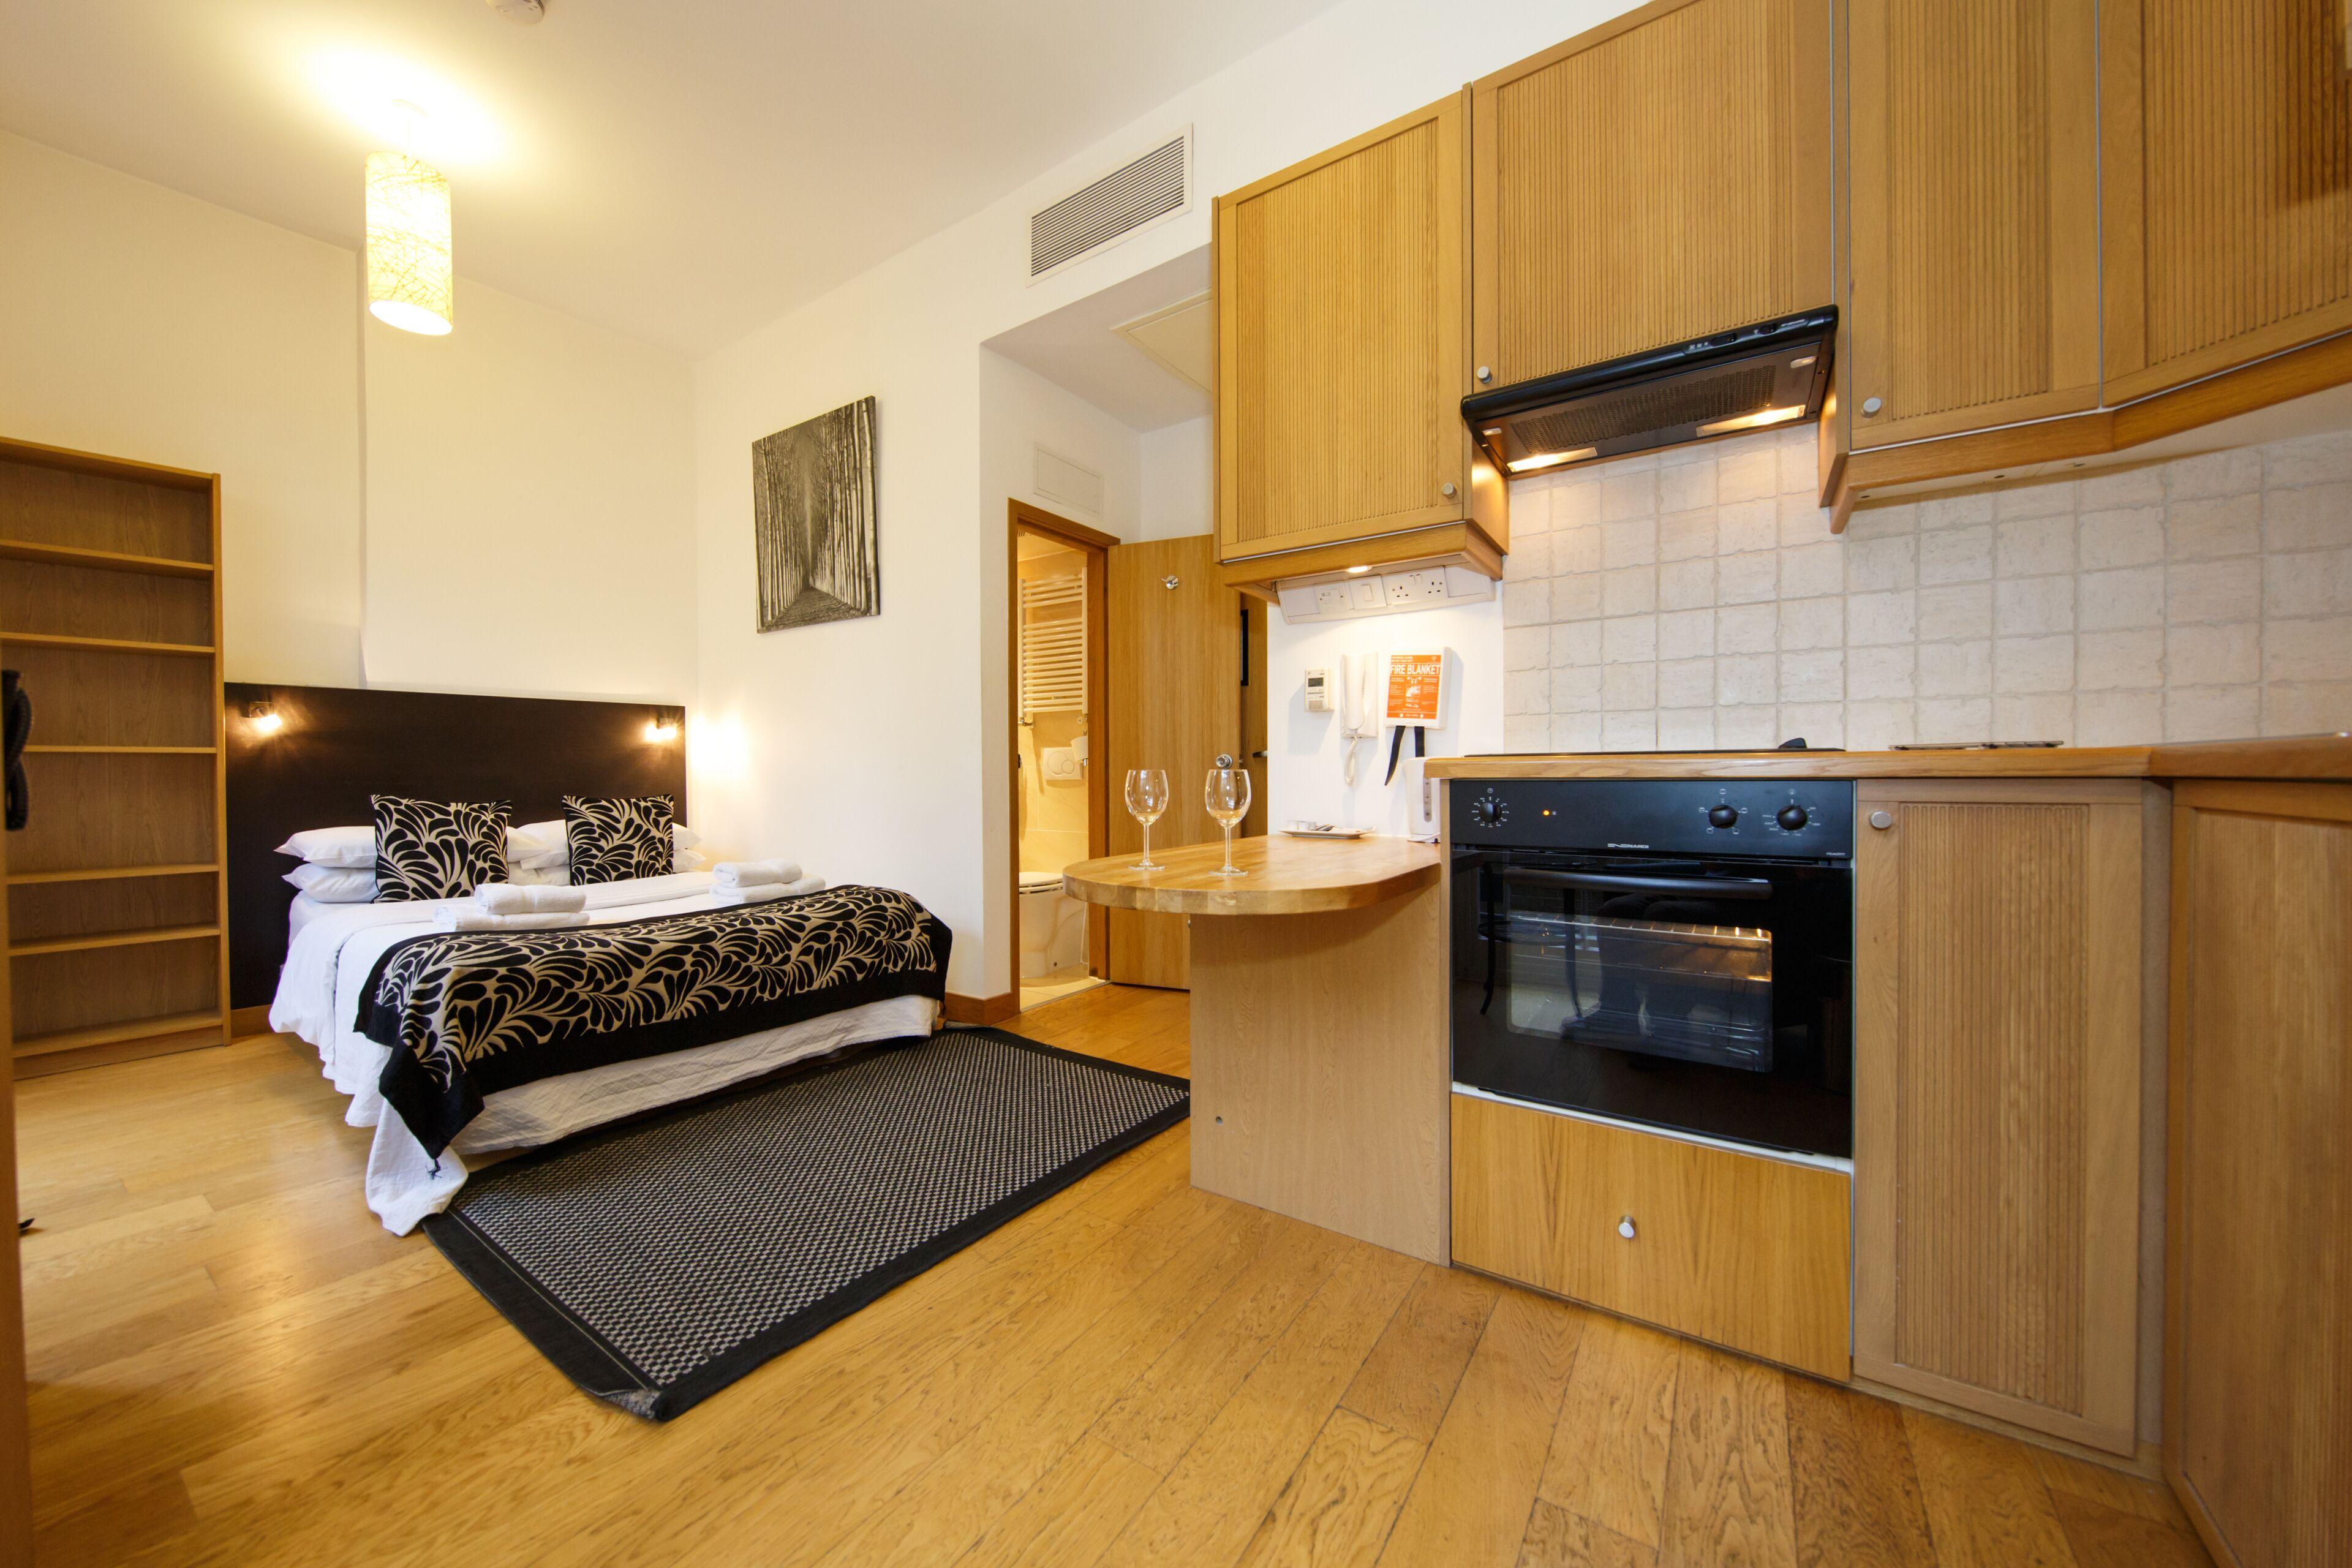 Studios 2 Let Serviced Apartments - Cartwright Gardens